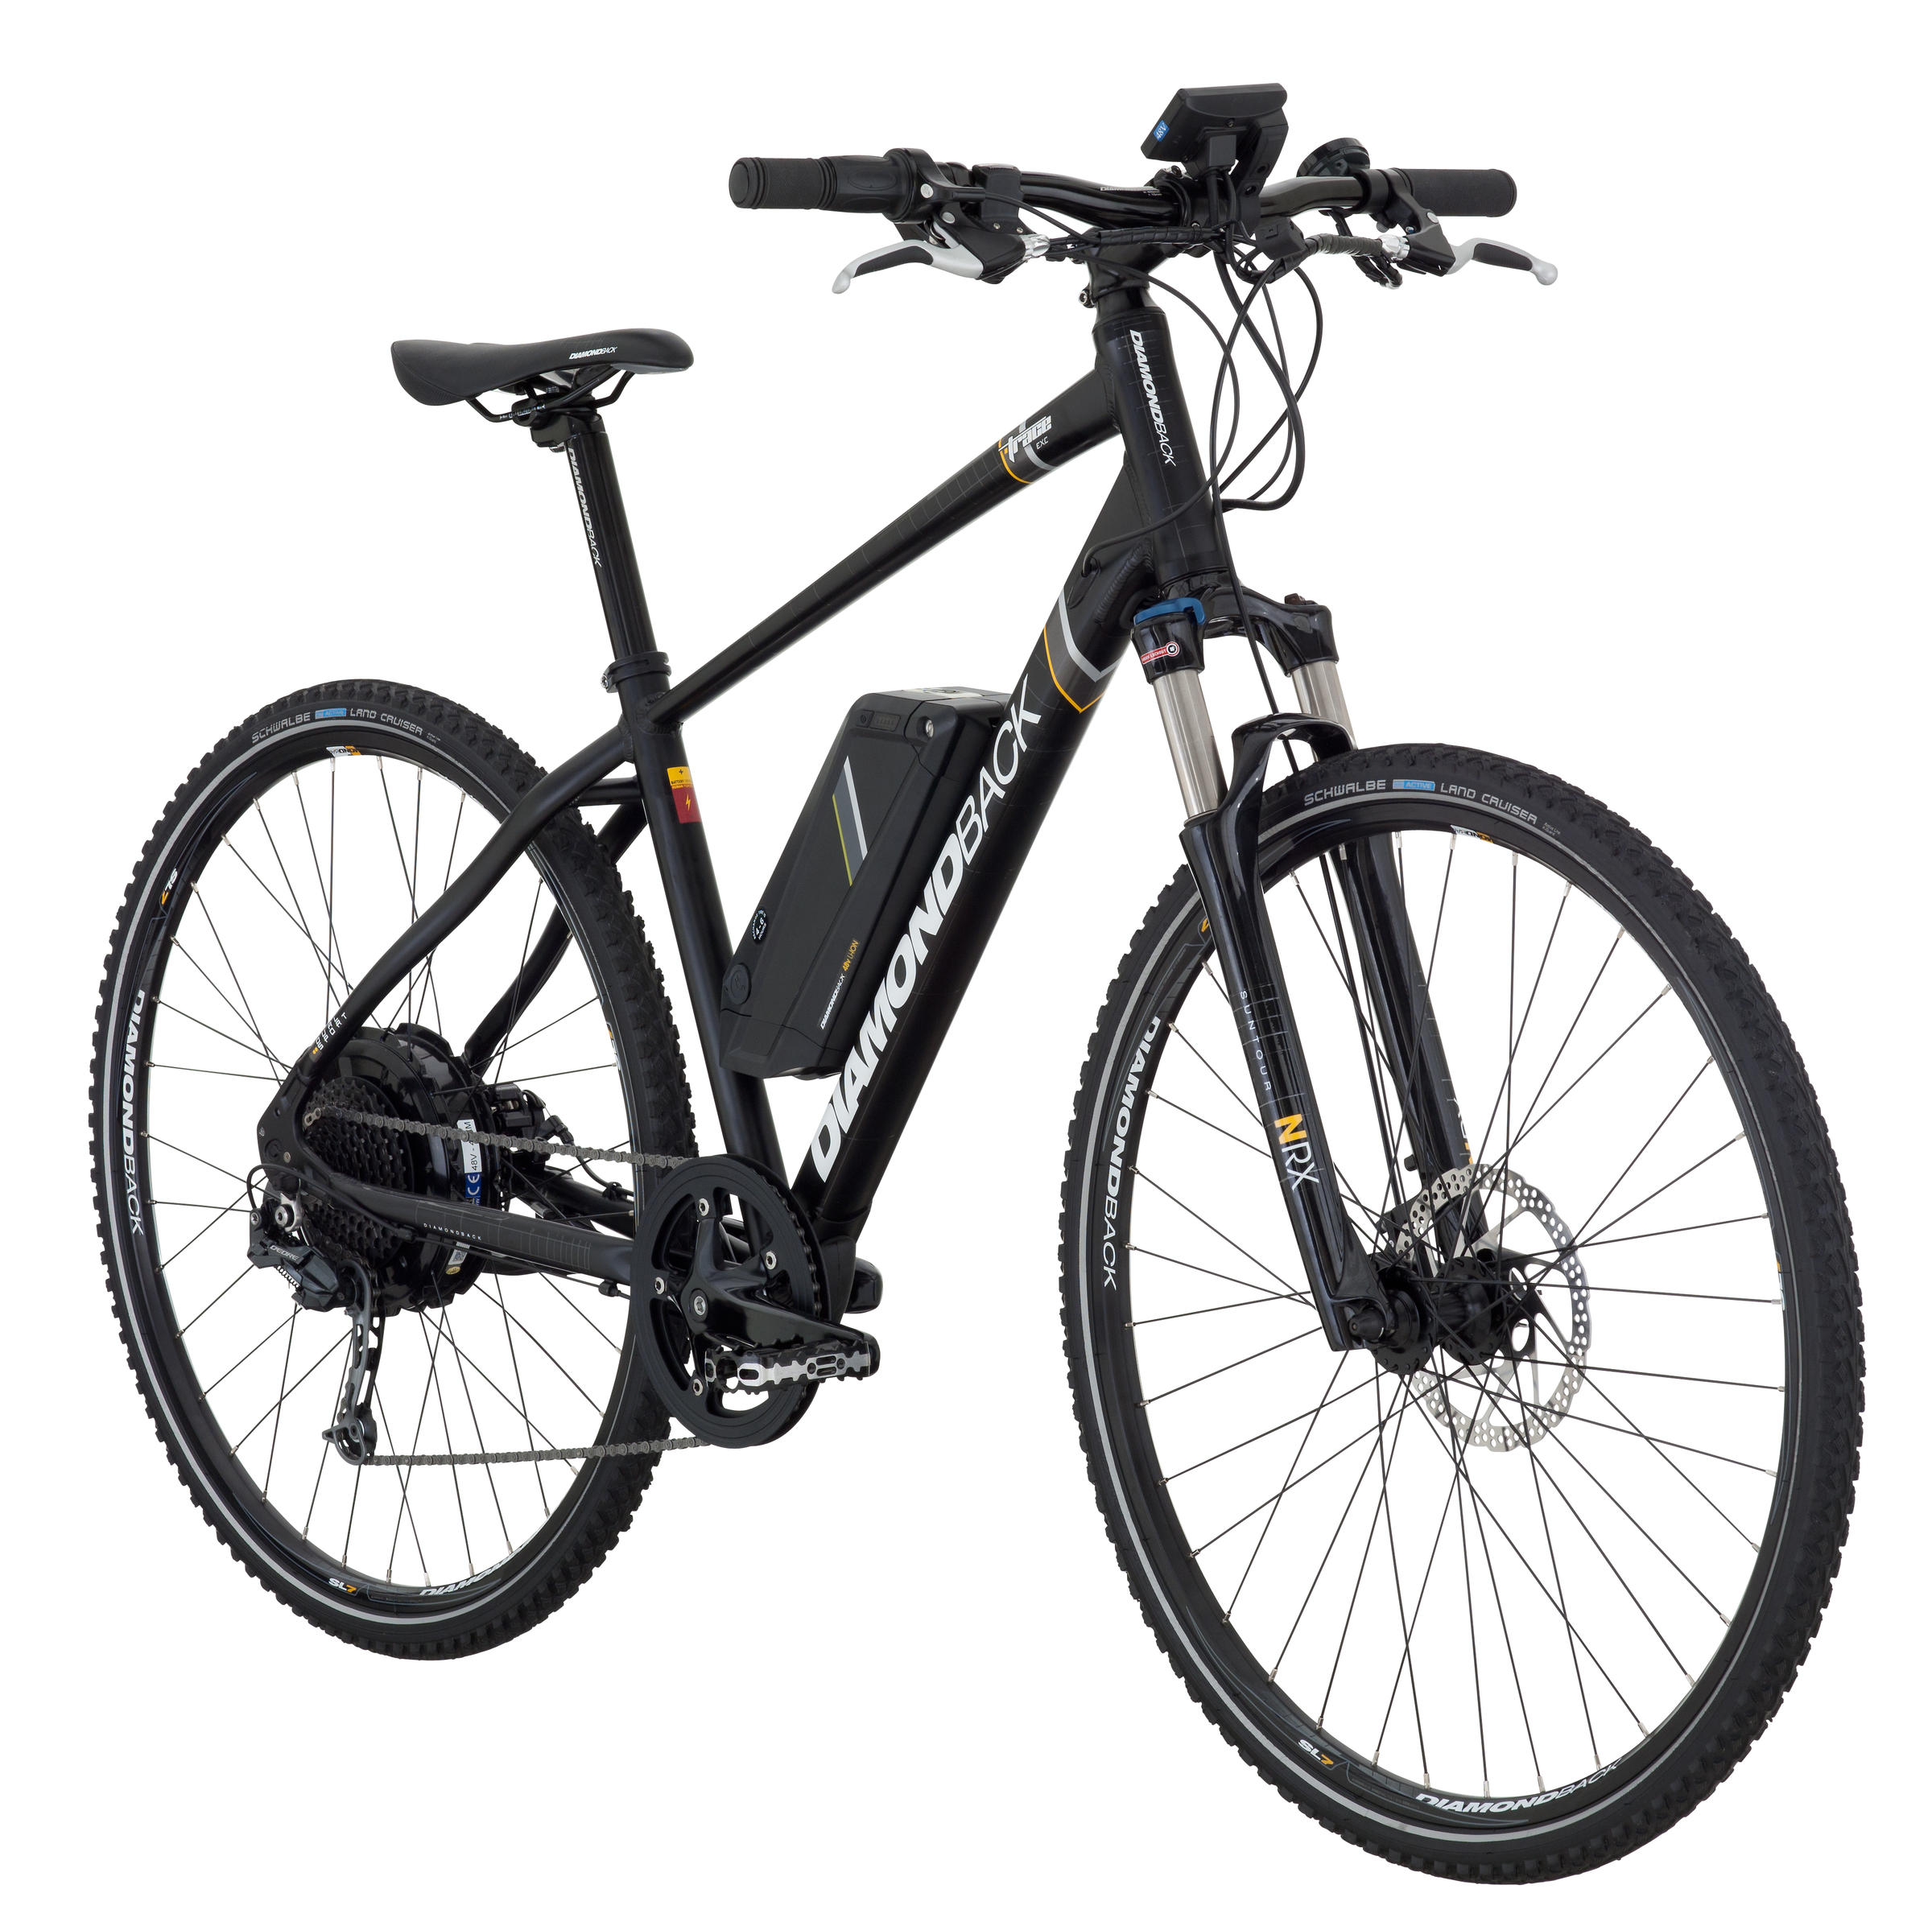 Diamondback Trace EXC - Wheel World Bike Shops - Road Bikes